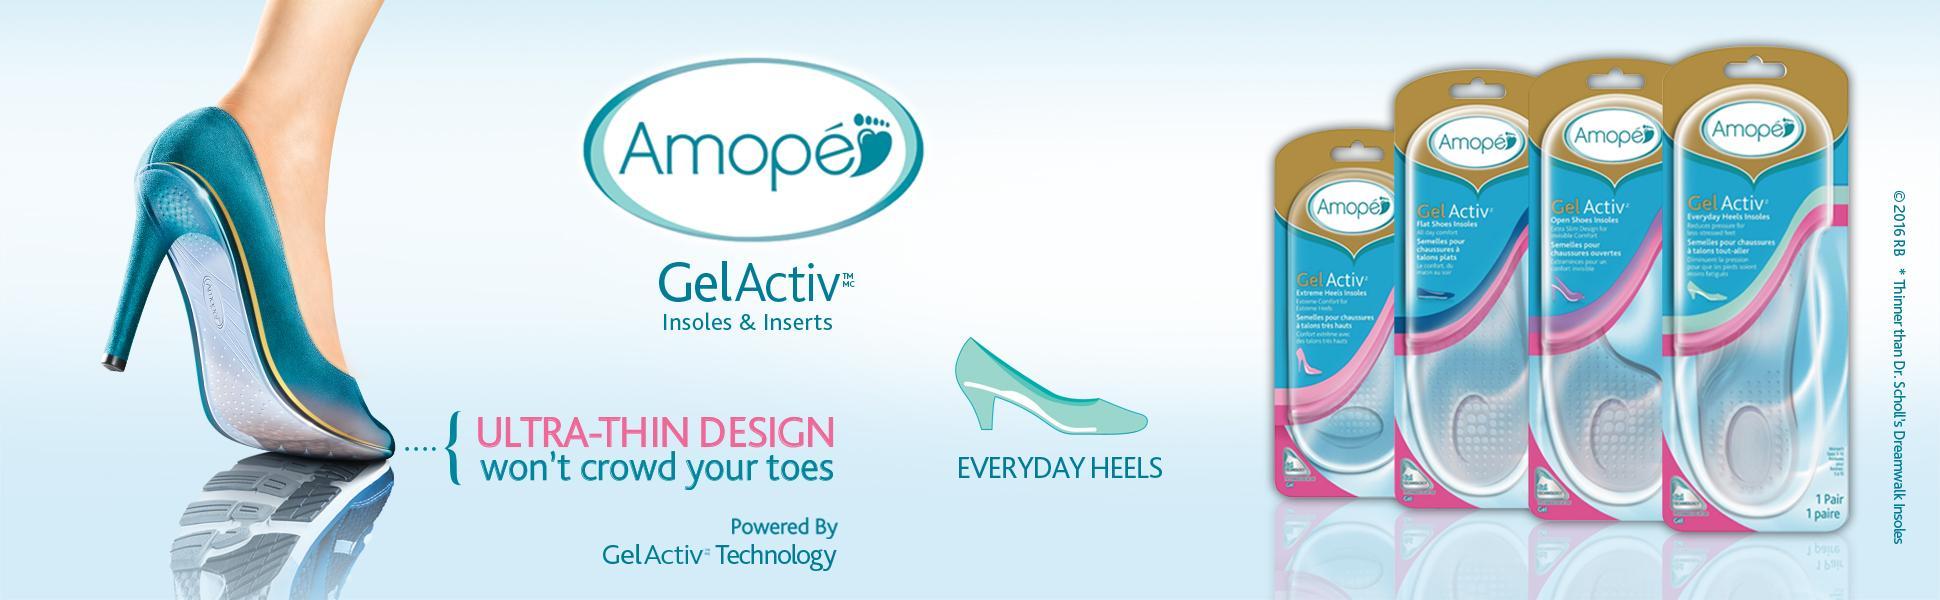 Amazon.com: Amope GelActiv Everyday Heels Insoles for Women - Size 5